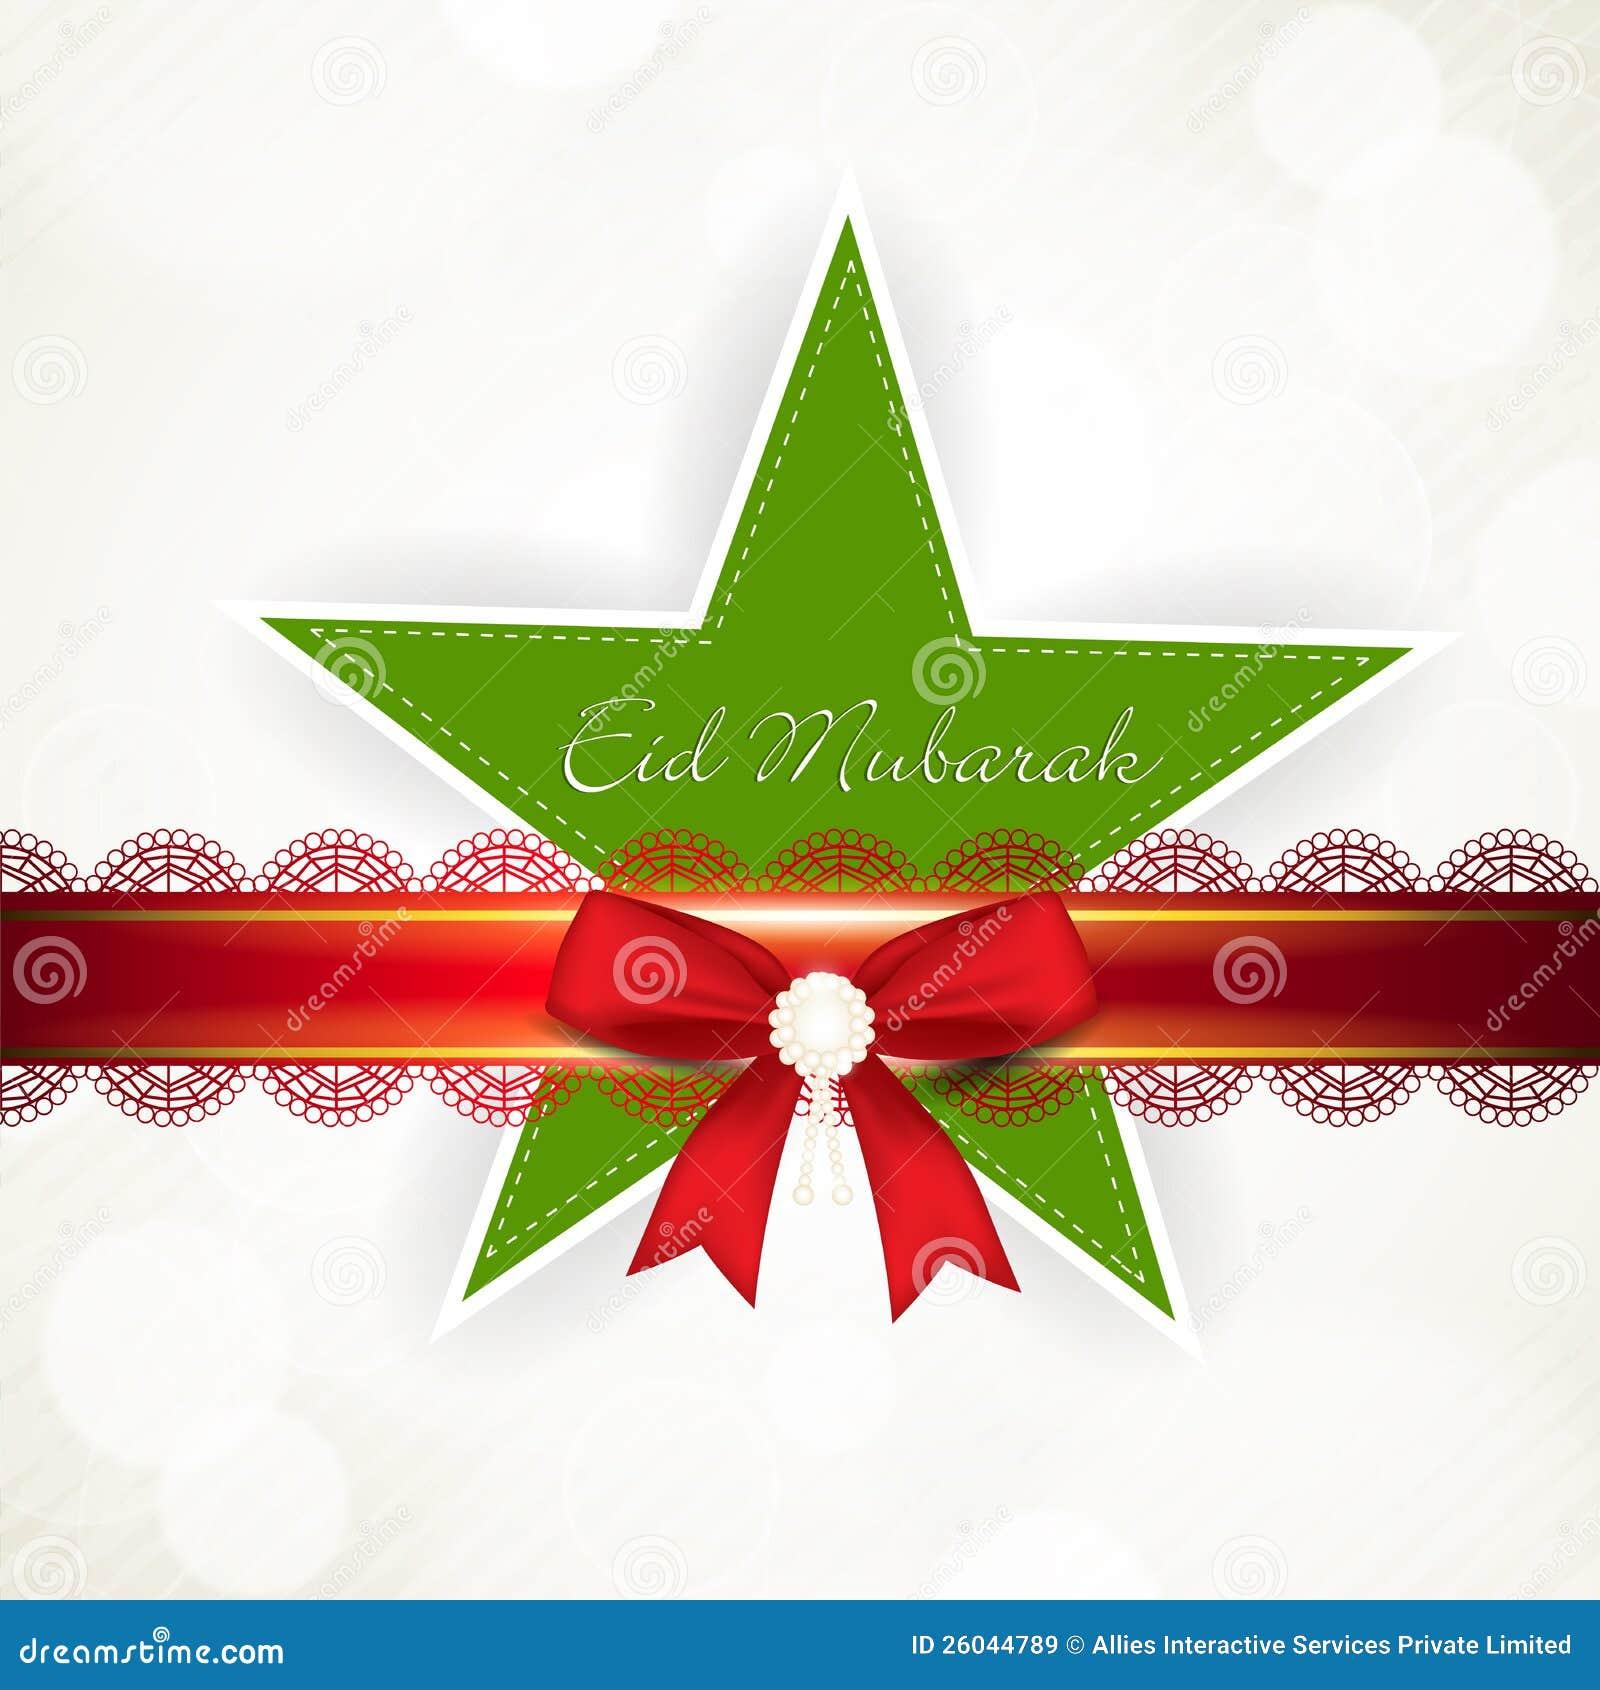 Eid Mubarak Stickers: Eid Mubarak Tag Or Sticker Stock Vector. Image Of Glow